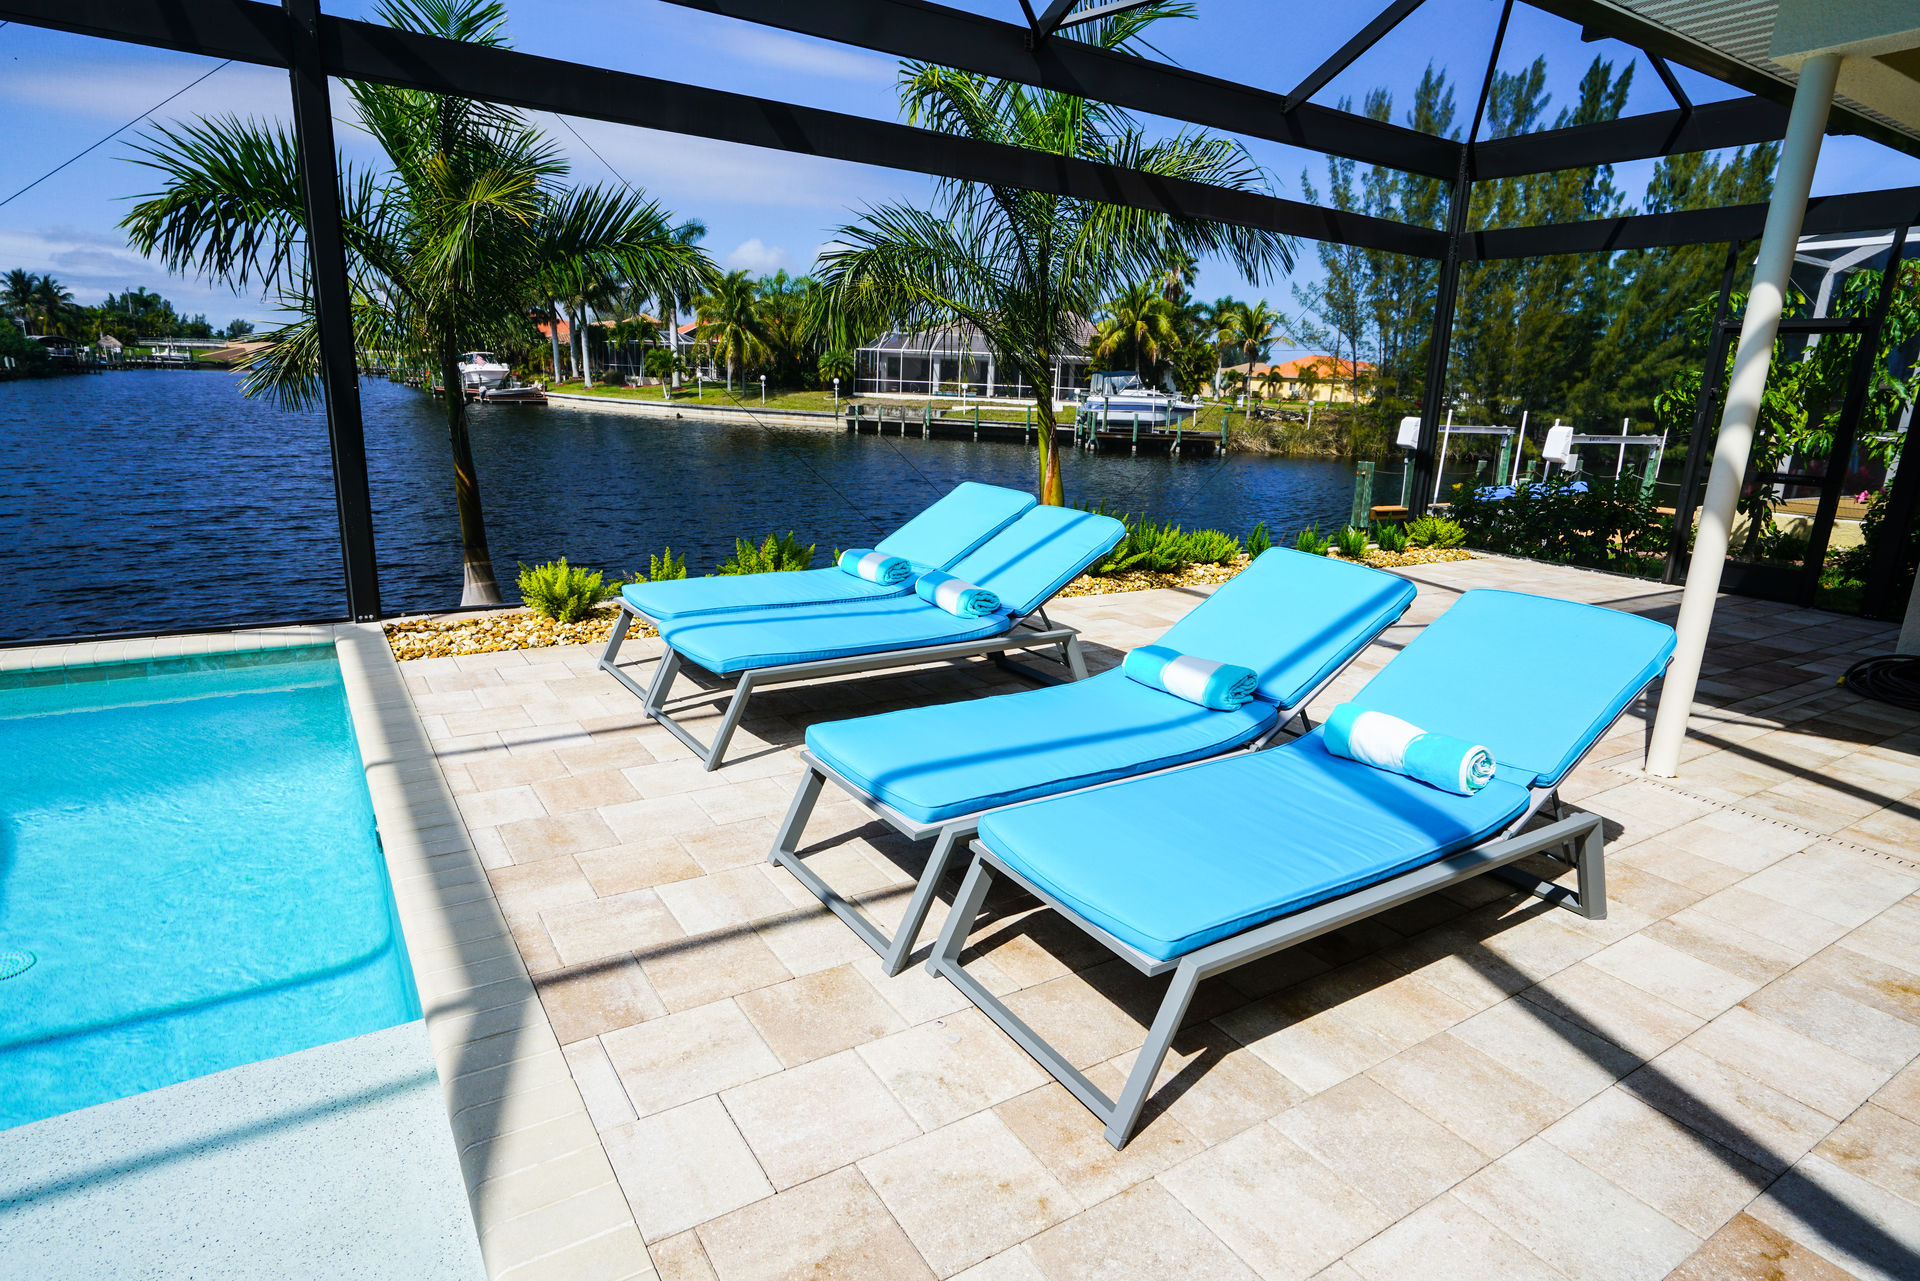 villa amalaya vacation villa in florida. Black Bedroom Furniture Sets. Home Design Ideas